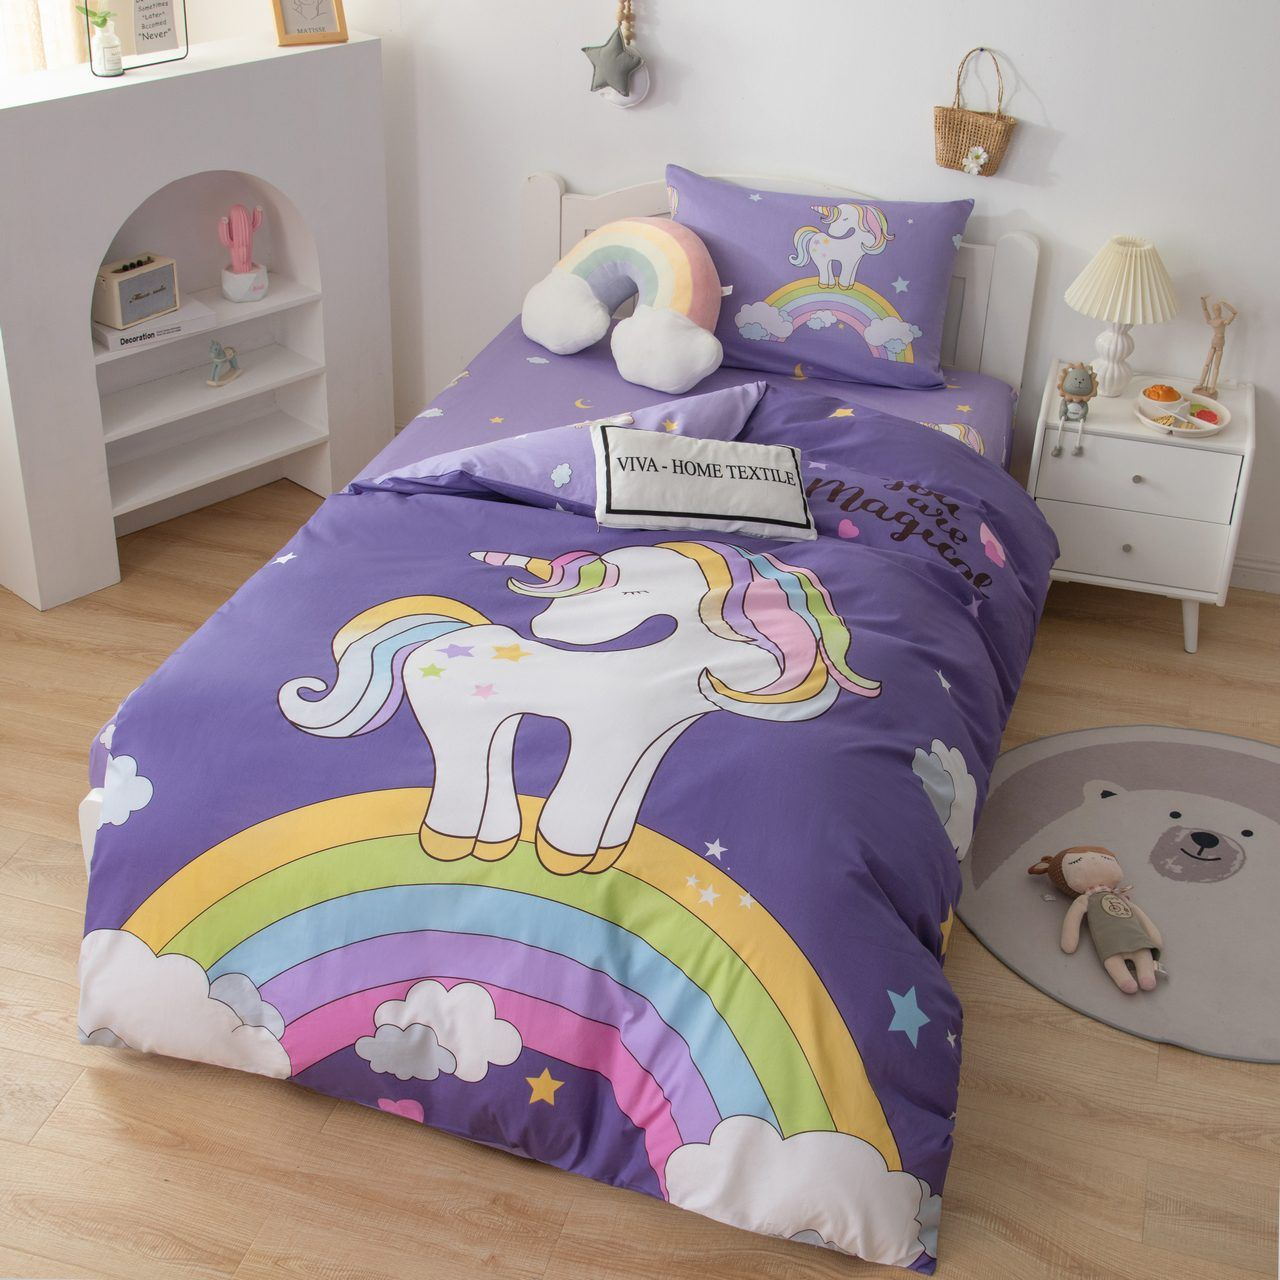 Sitrade / Sateen bedding set for children CD028, 1.5 sleeping pillowcase 50-70